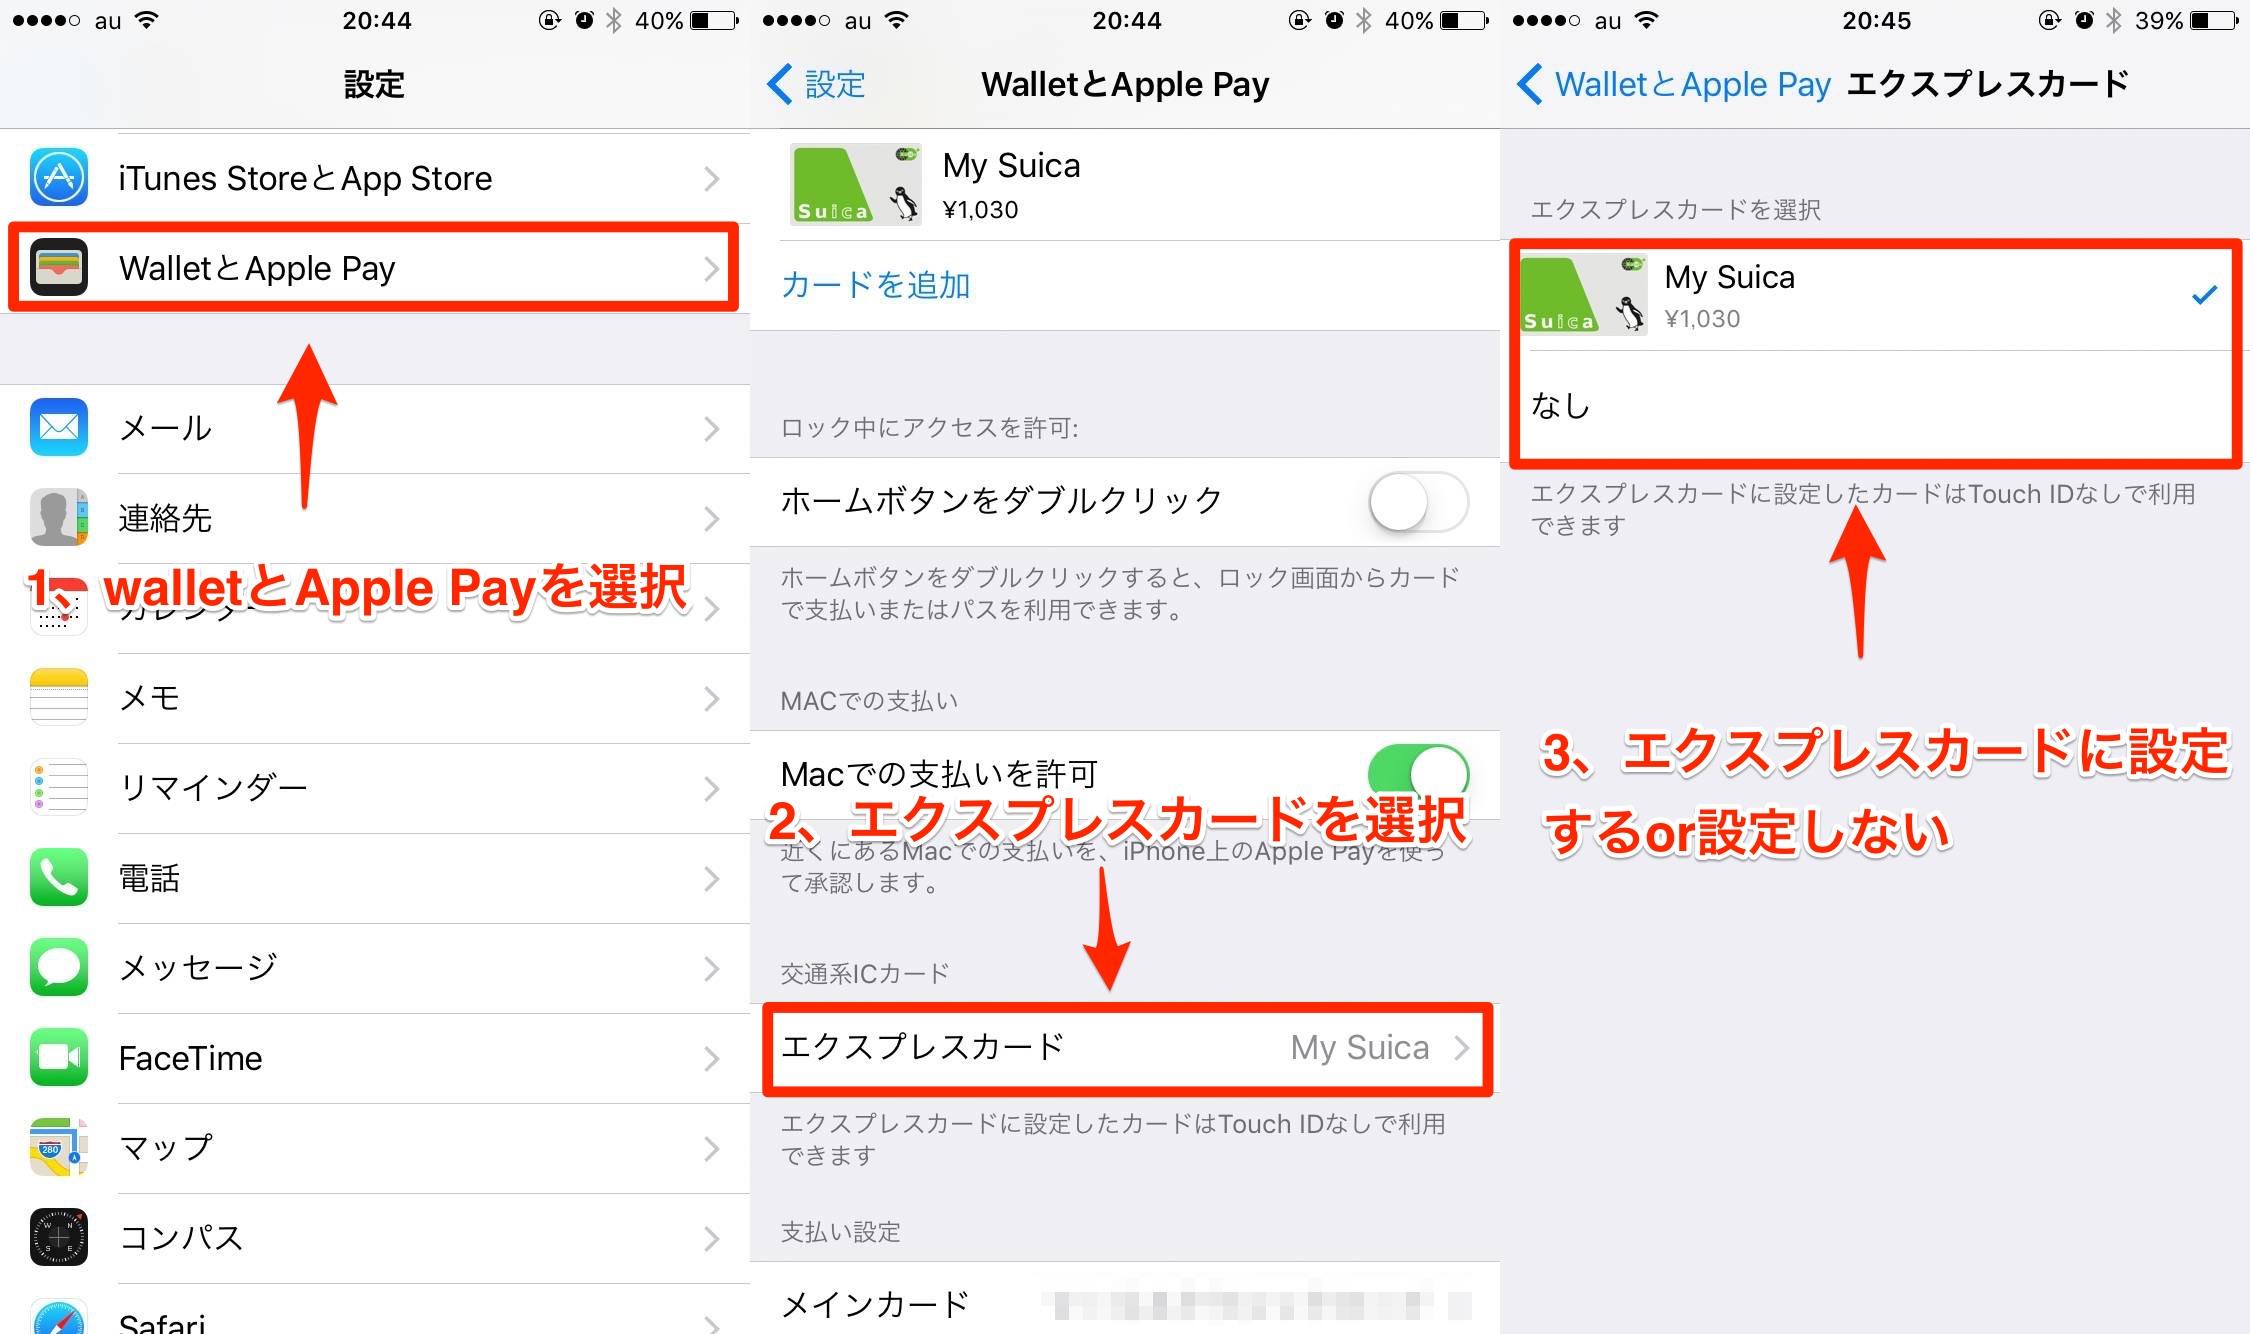 Apple Pay Suica10 - Suicaカードを持ってない人がApple PayにSuicaを新規登録する方法